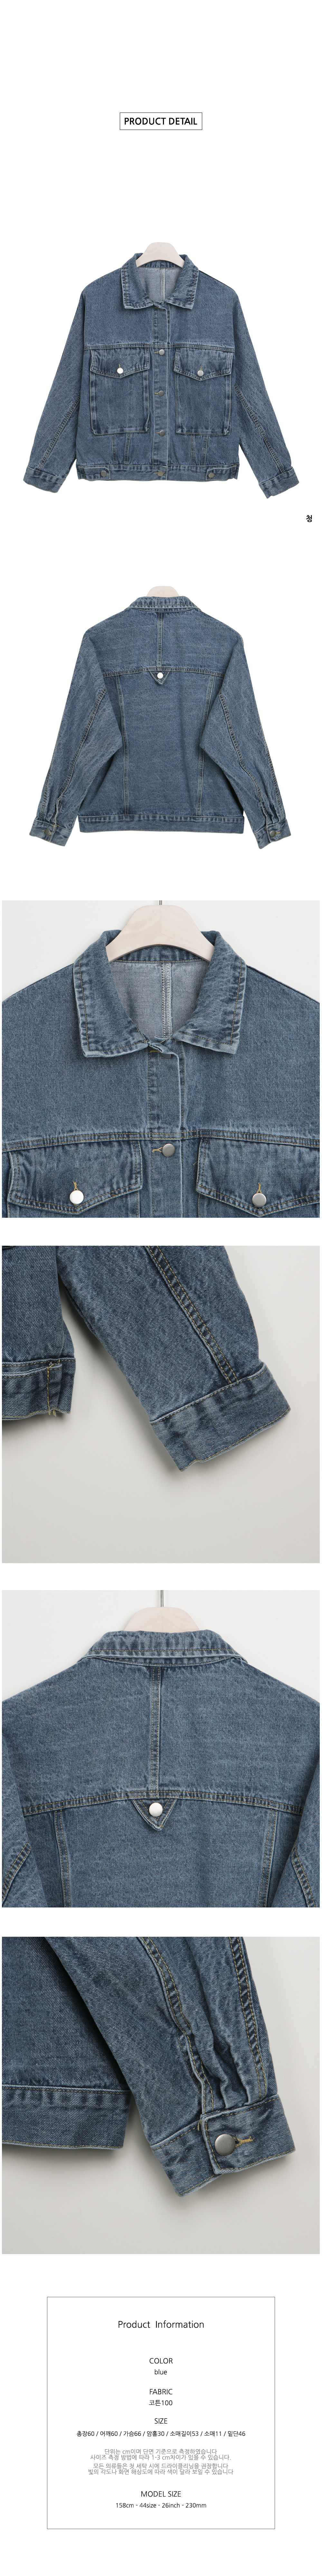 Pocket rectangular denim jacket O#YW354